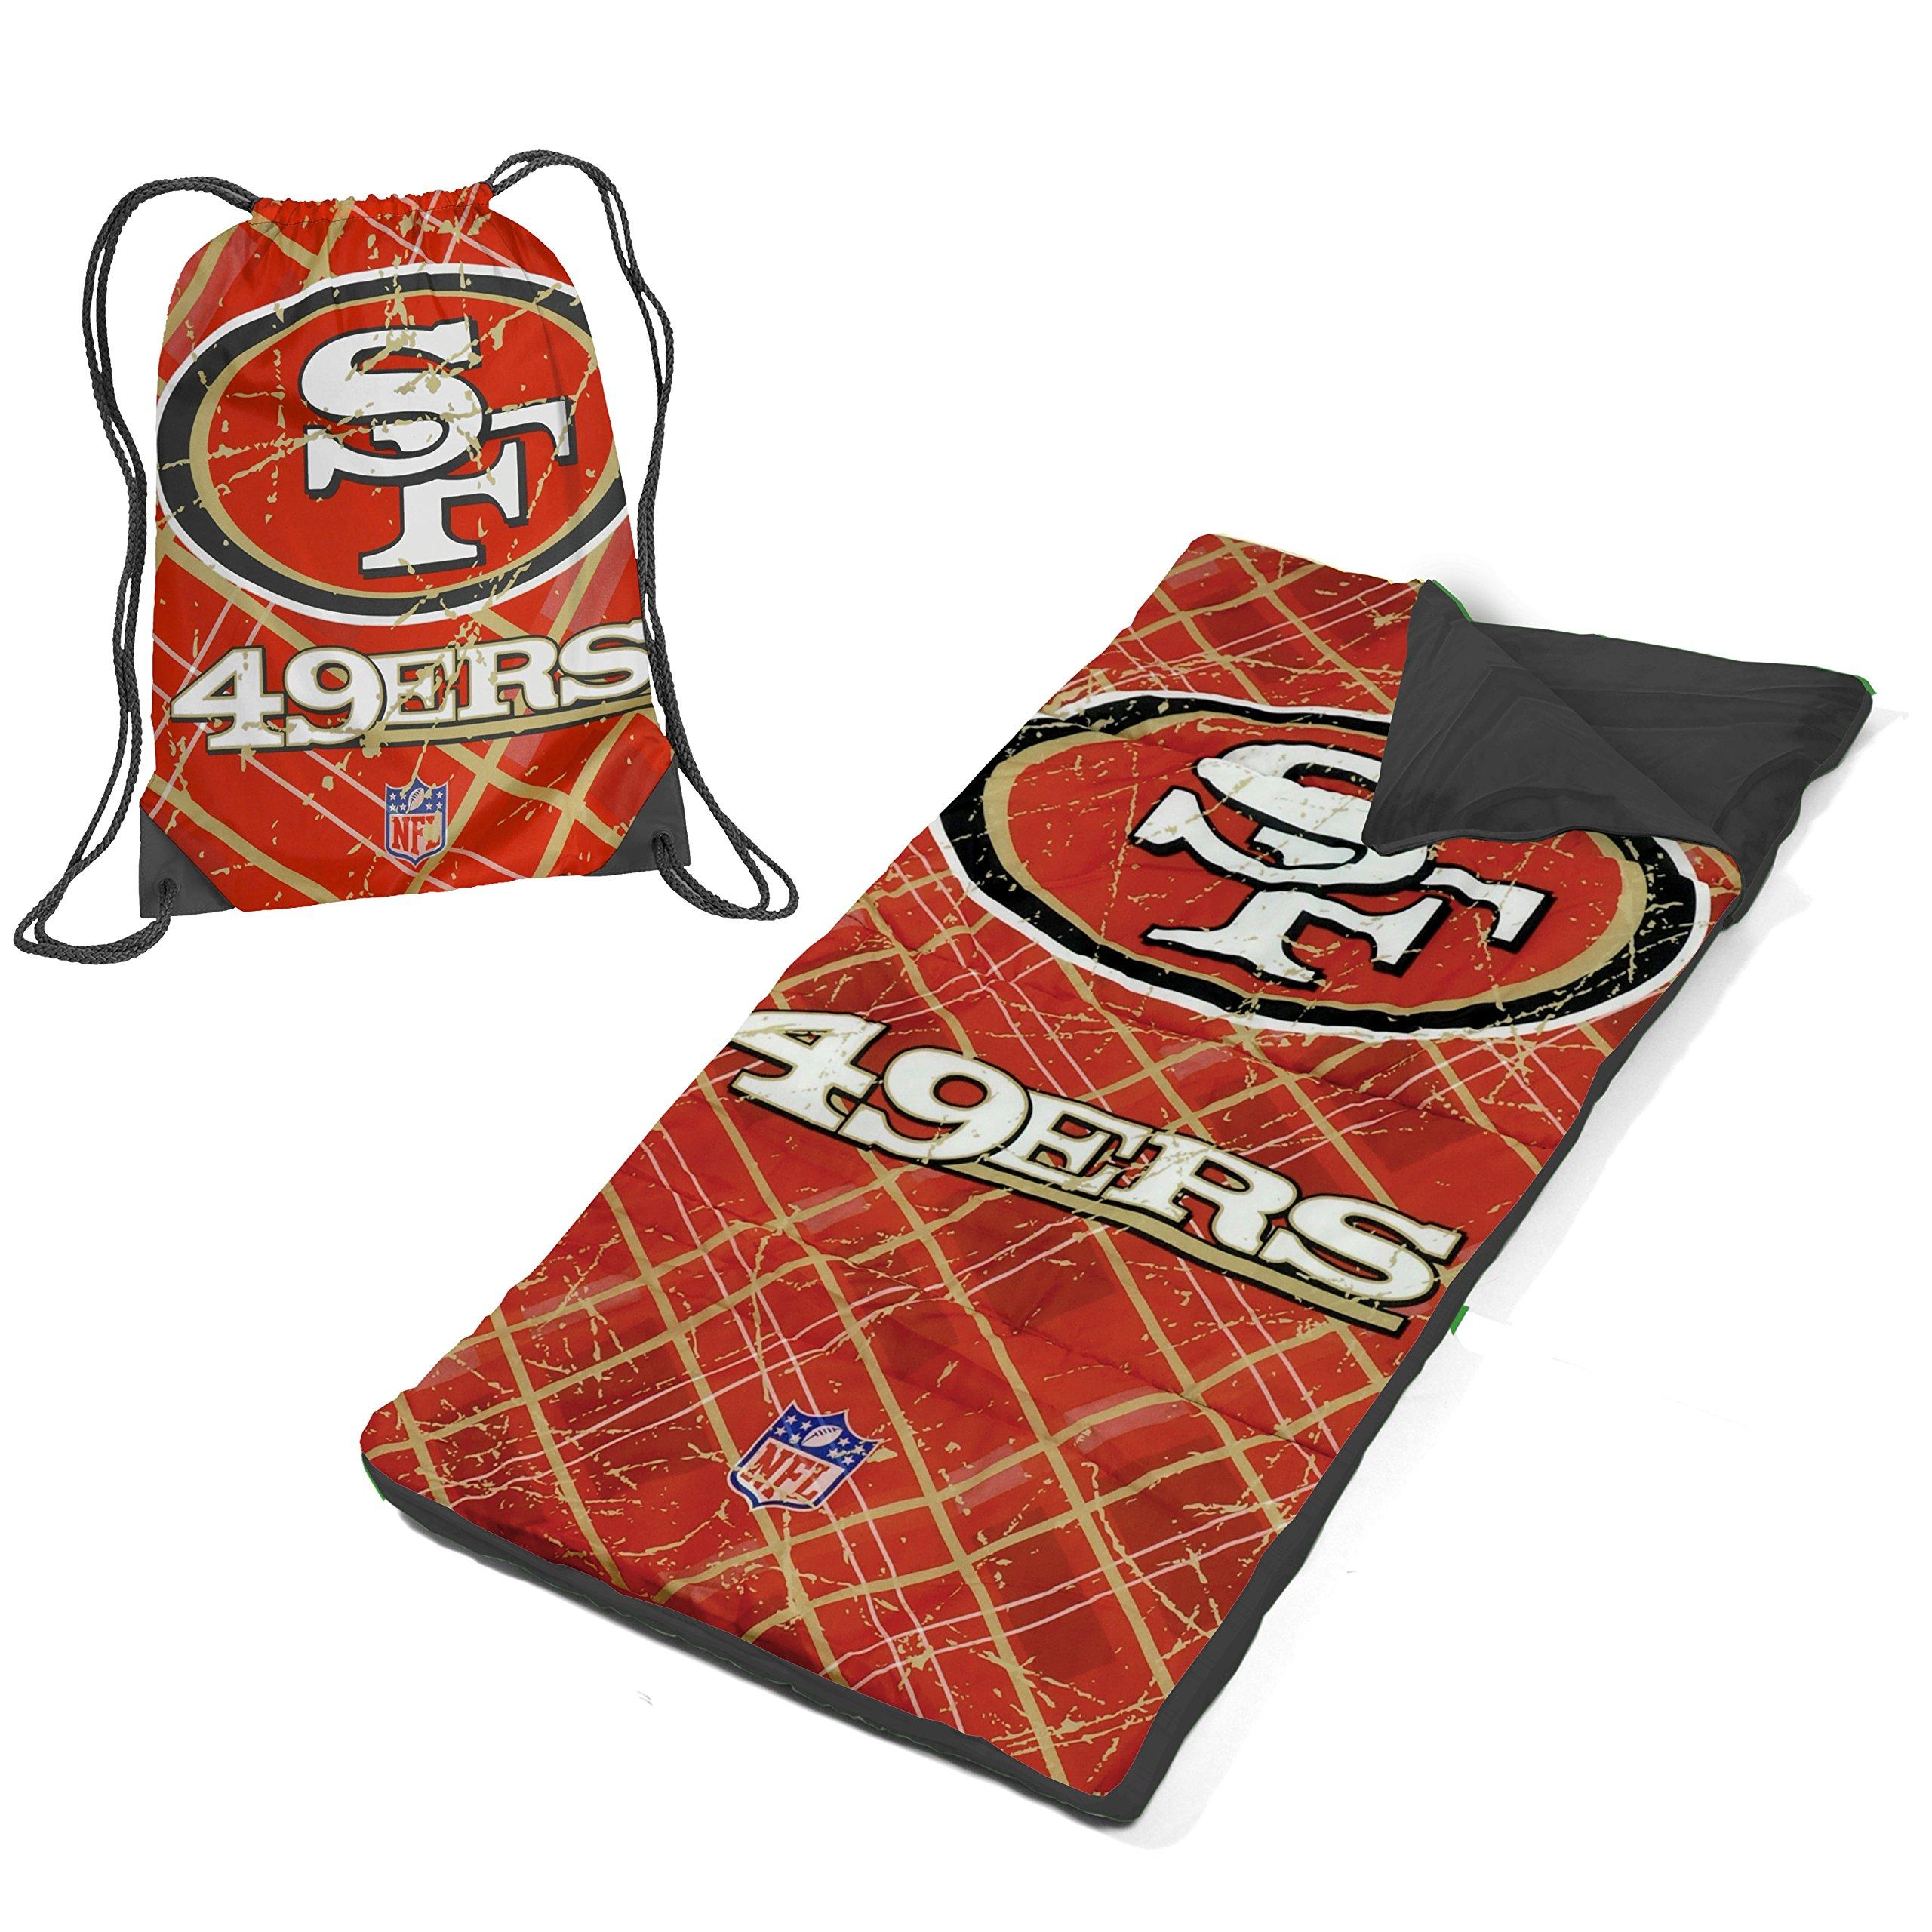 DE 2 Piece Kids Boys Red Gold NFL San Francisco 49ers Themed Sleeping Bag, American Sports Football Team Sleep Sack Nap Mat, Check Diamond Golden Plaid Line Pattern String Bag Light Travel Bed Roll,